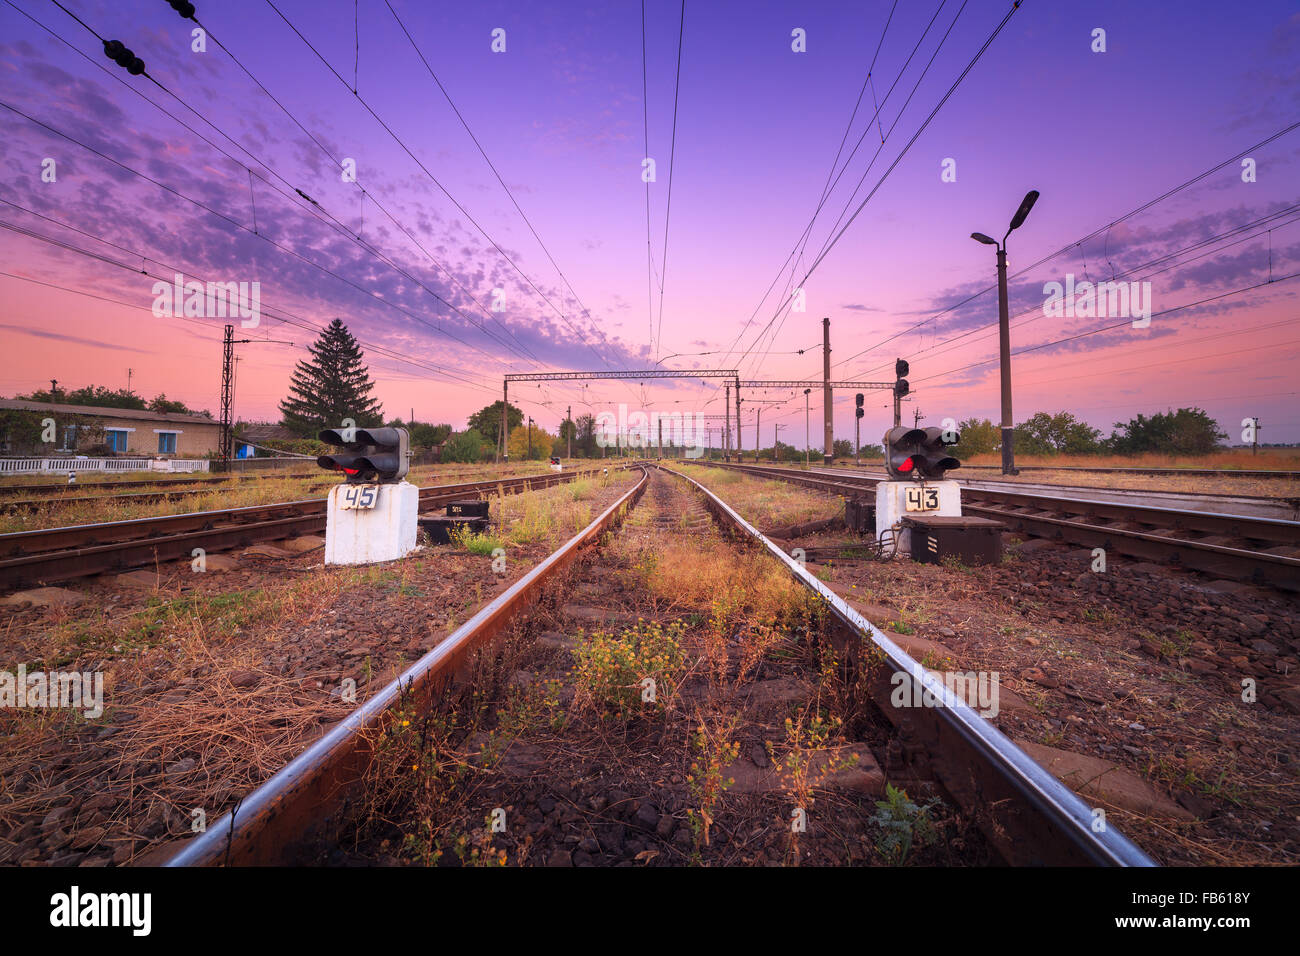 Train platform and traffic light at sunset. Railroad. Railway station - Stock Image